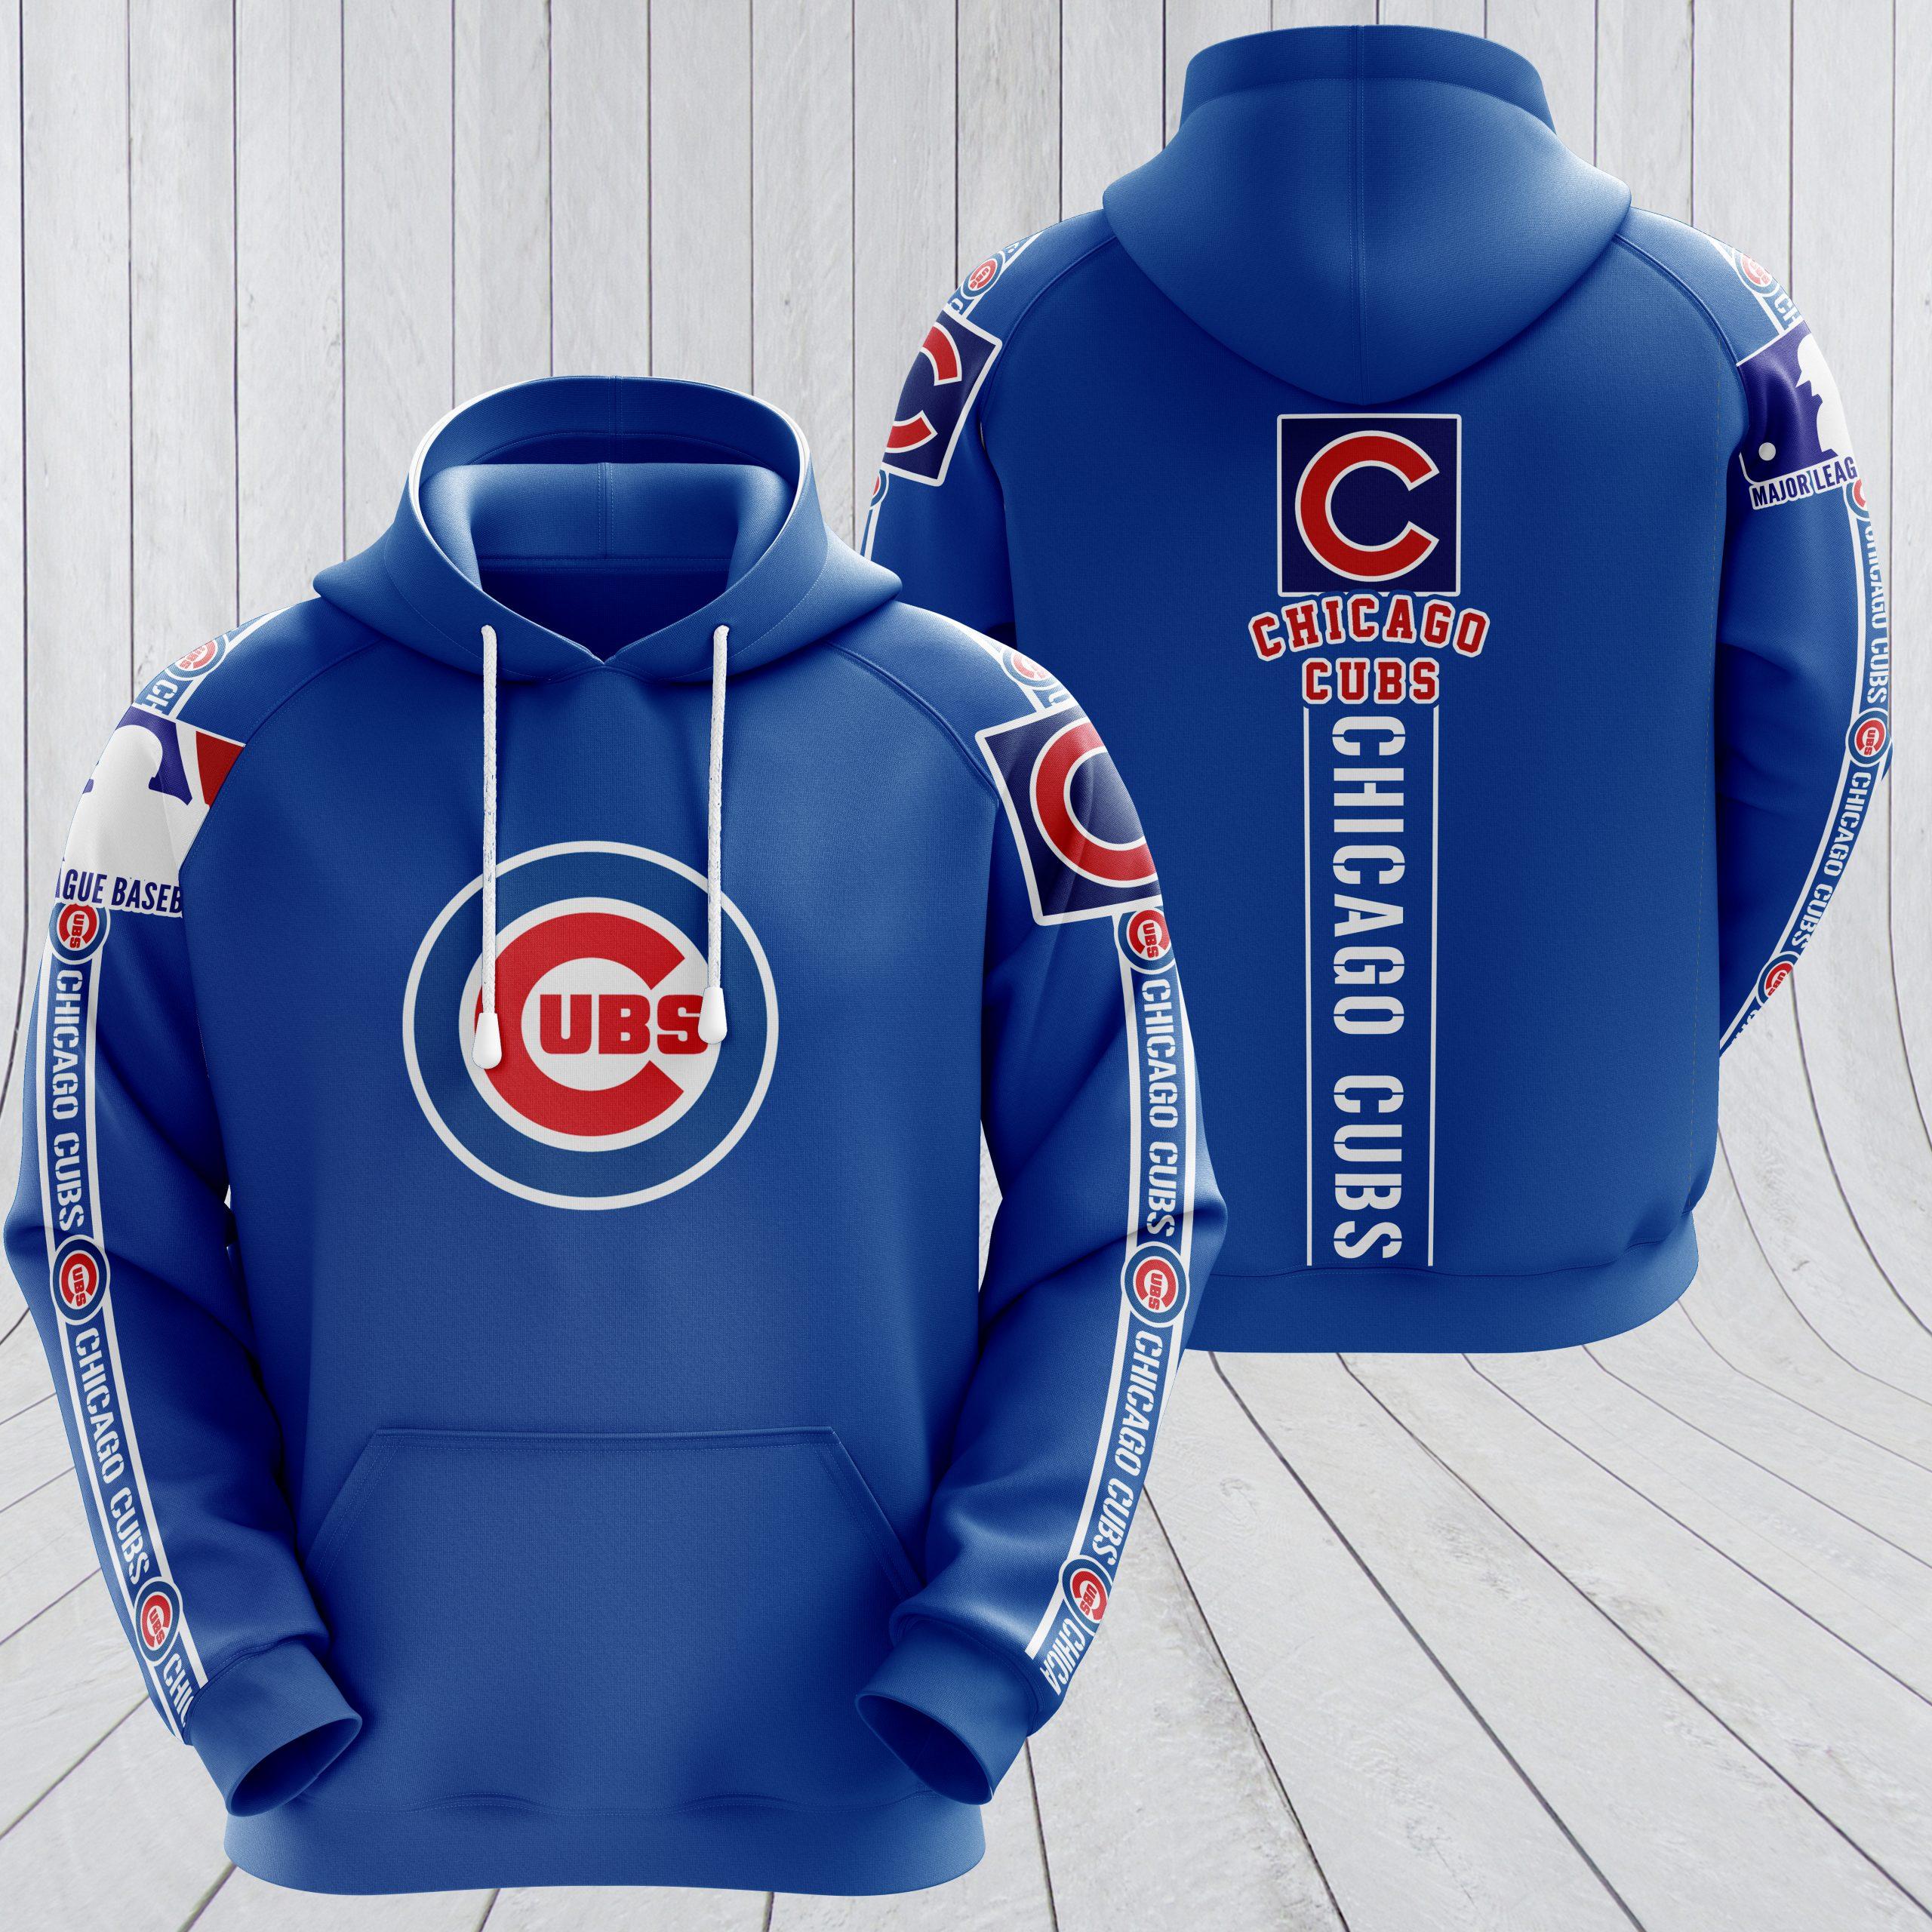 MLB chicago cubs full printing hoodie - royal 1